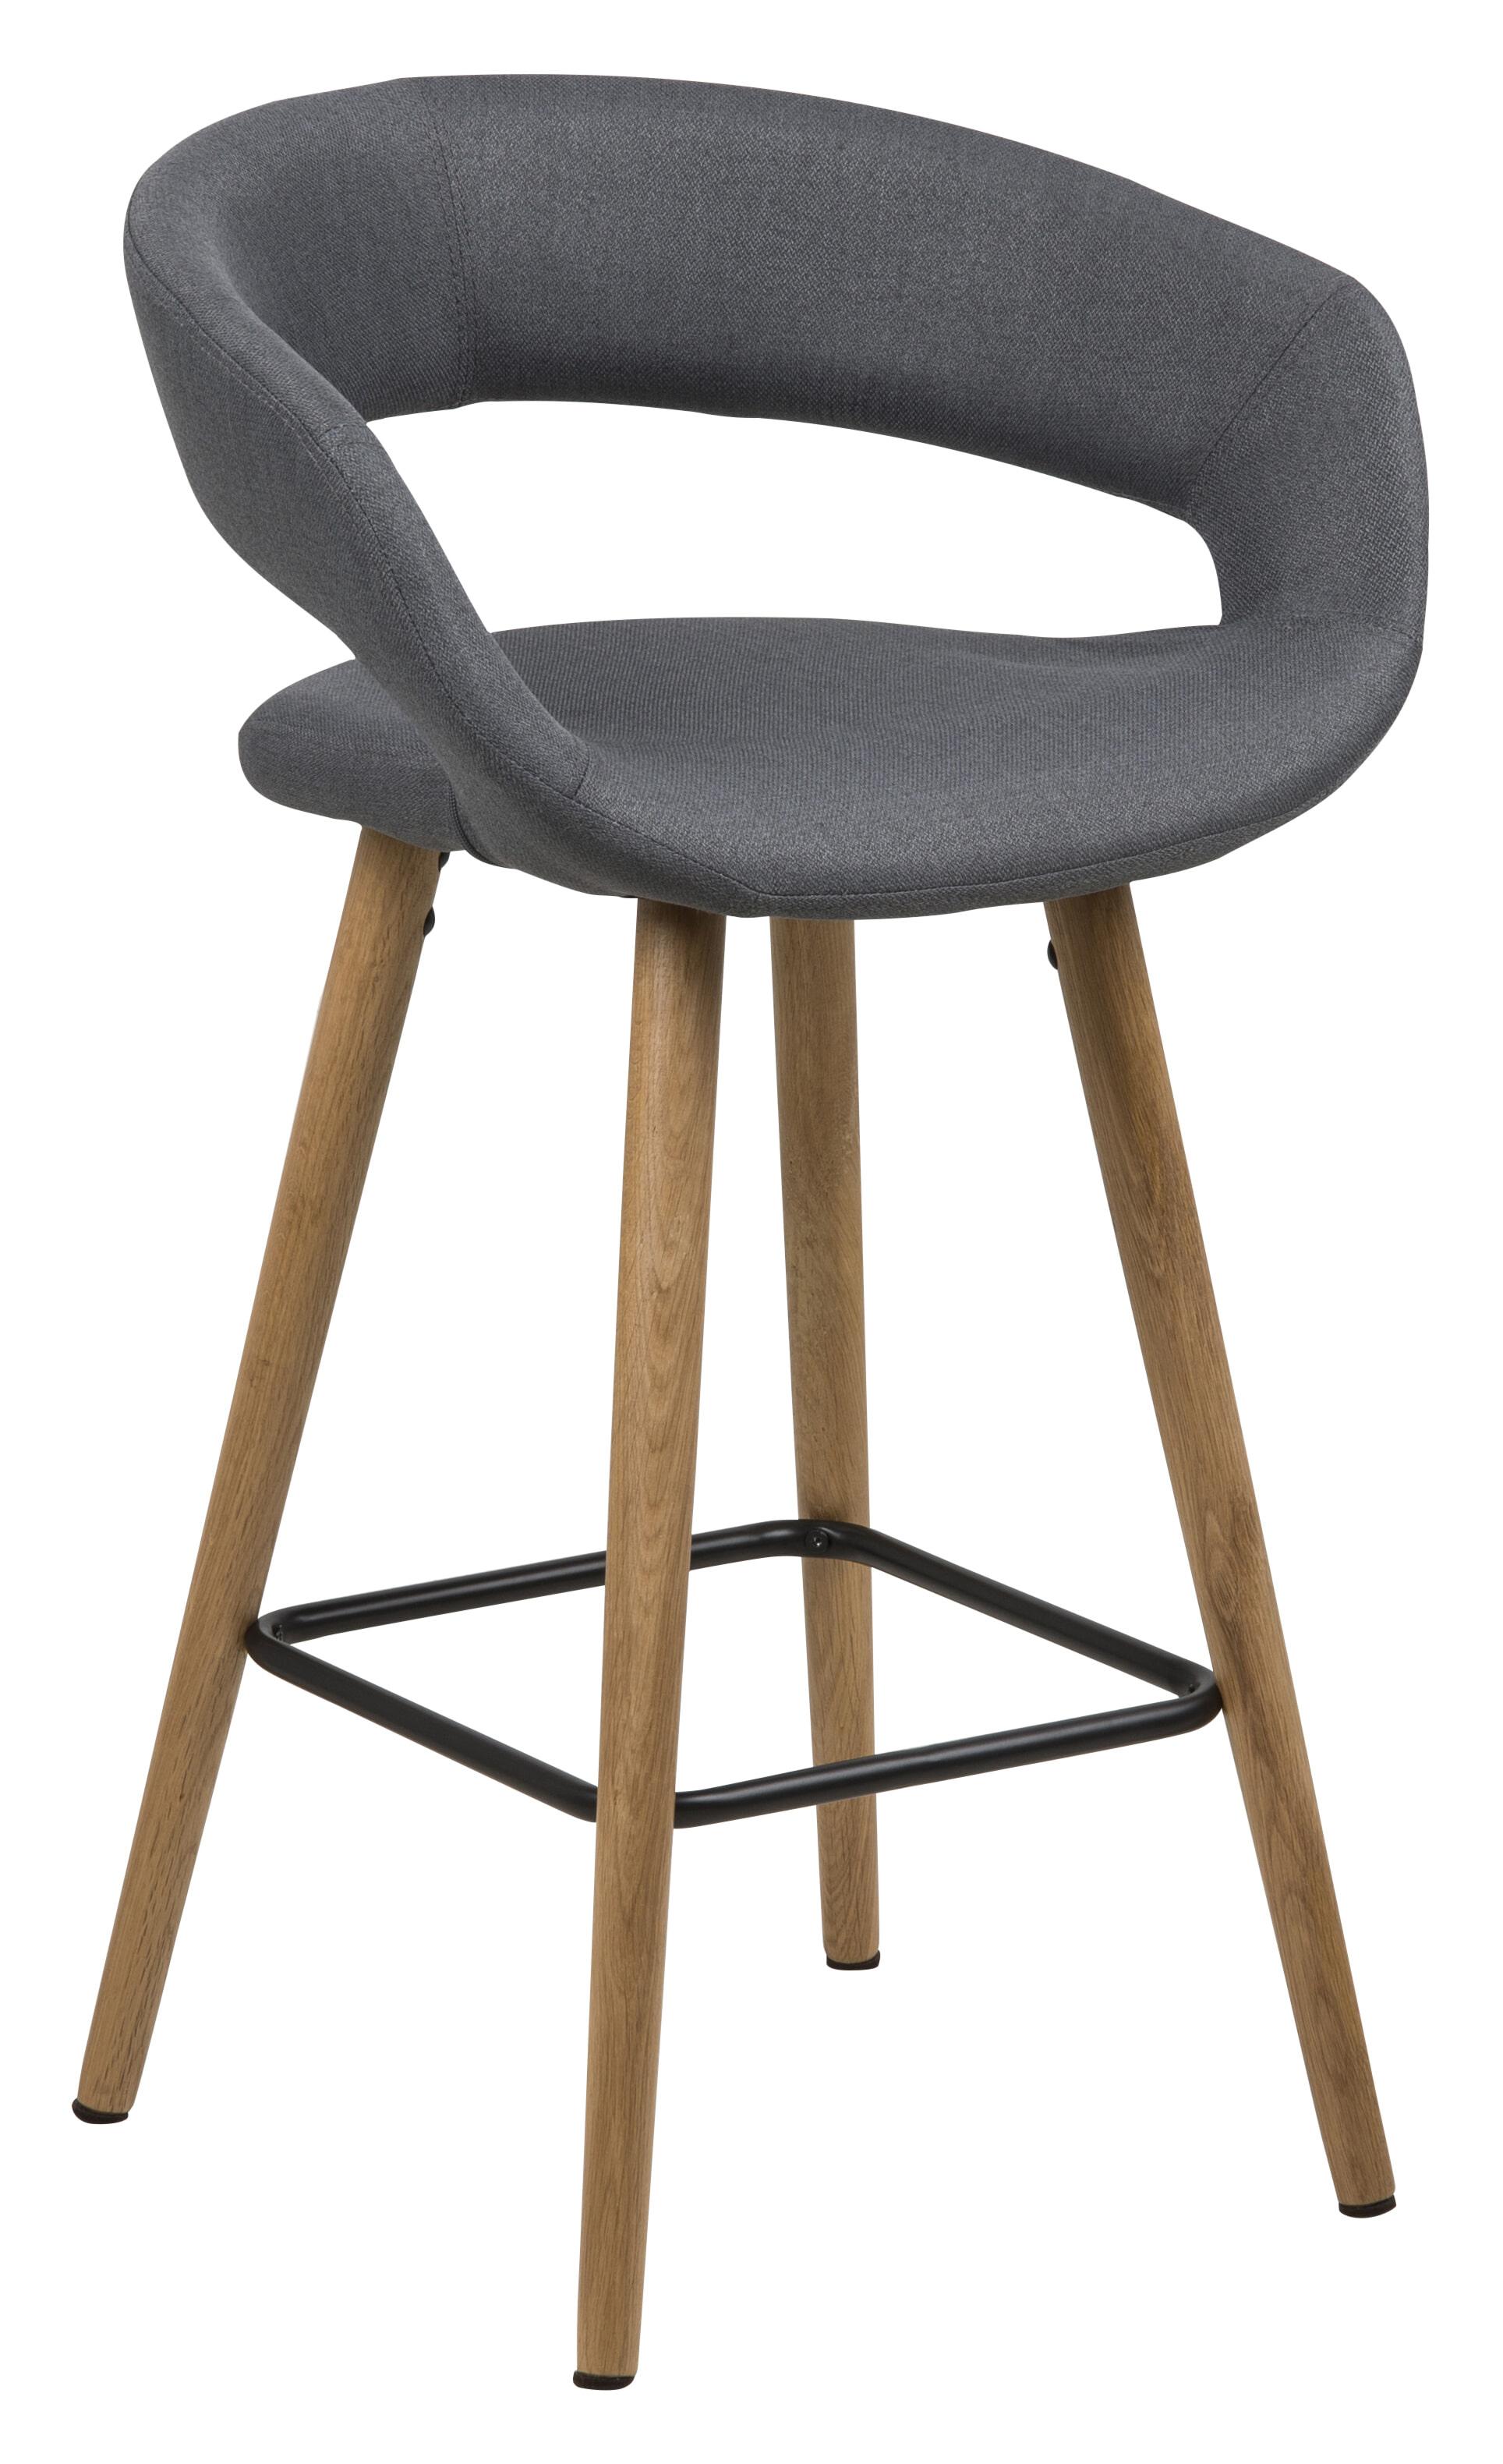 Barstoel 'Pia' (zithoogte 65,5 cm), kleur donkergrijs